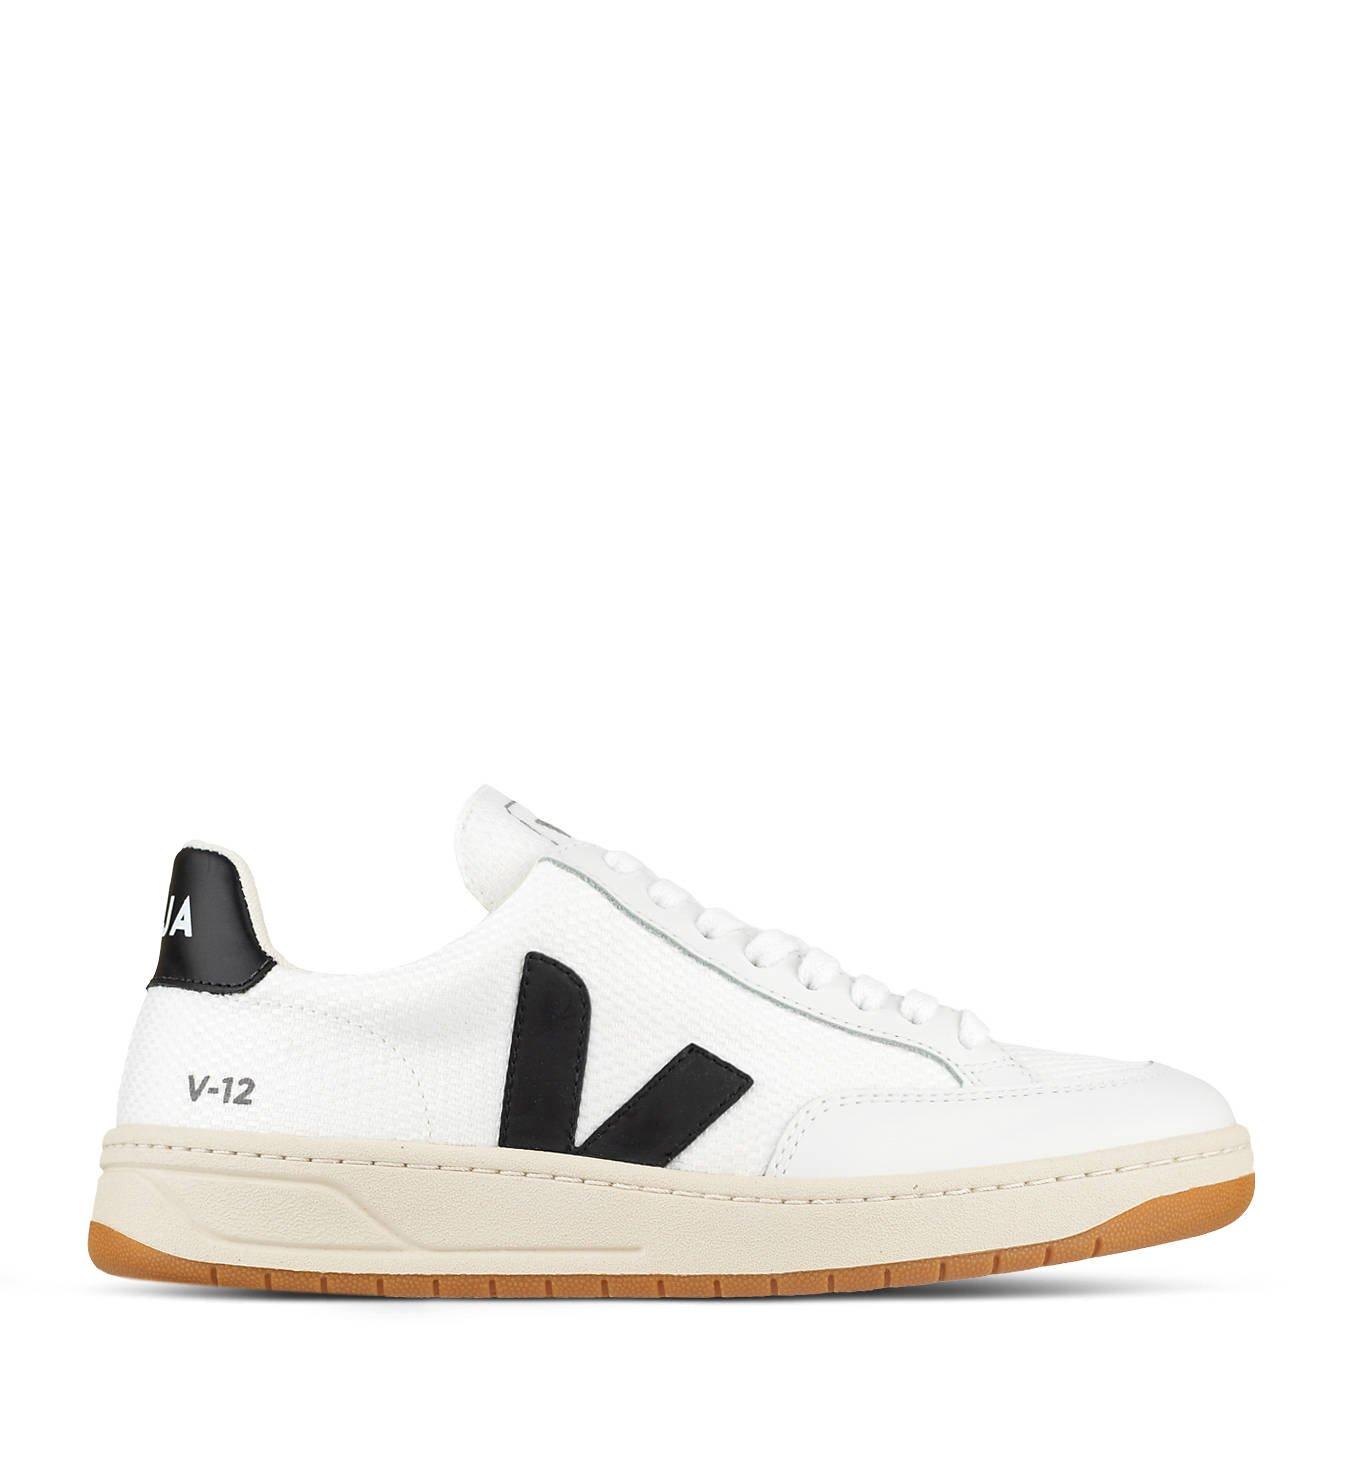 Buty Veja V 12 B Mesh White Black Sneakersy Damskie Panpablo Pl